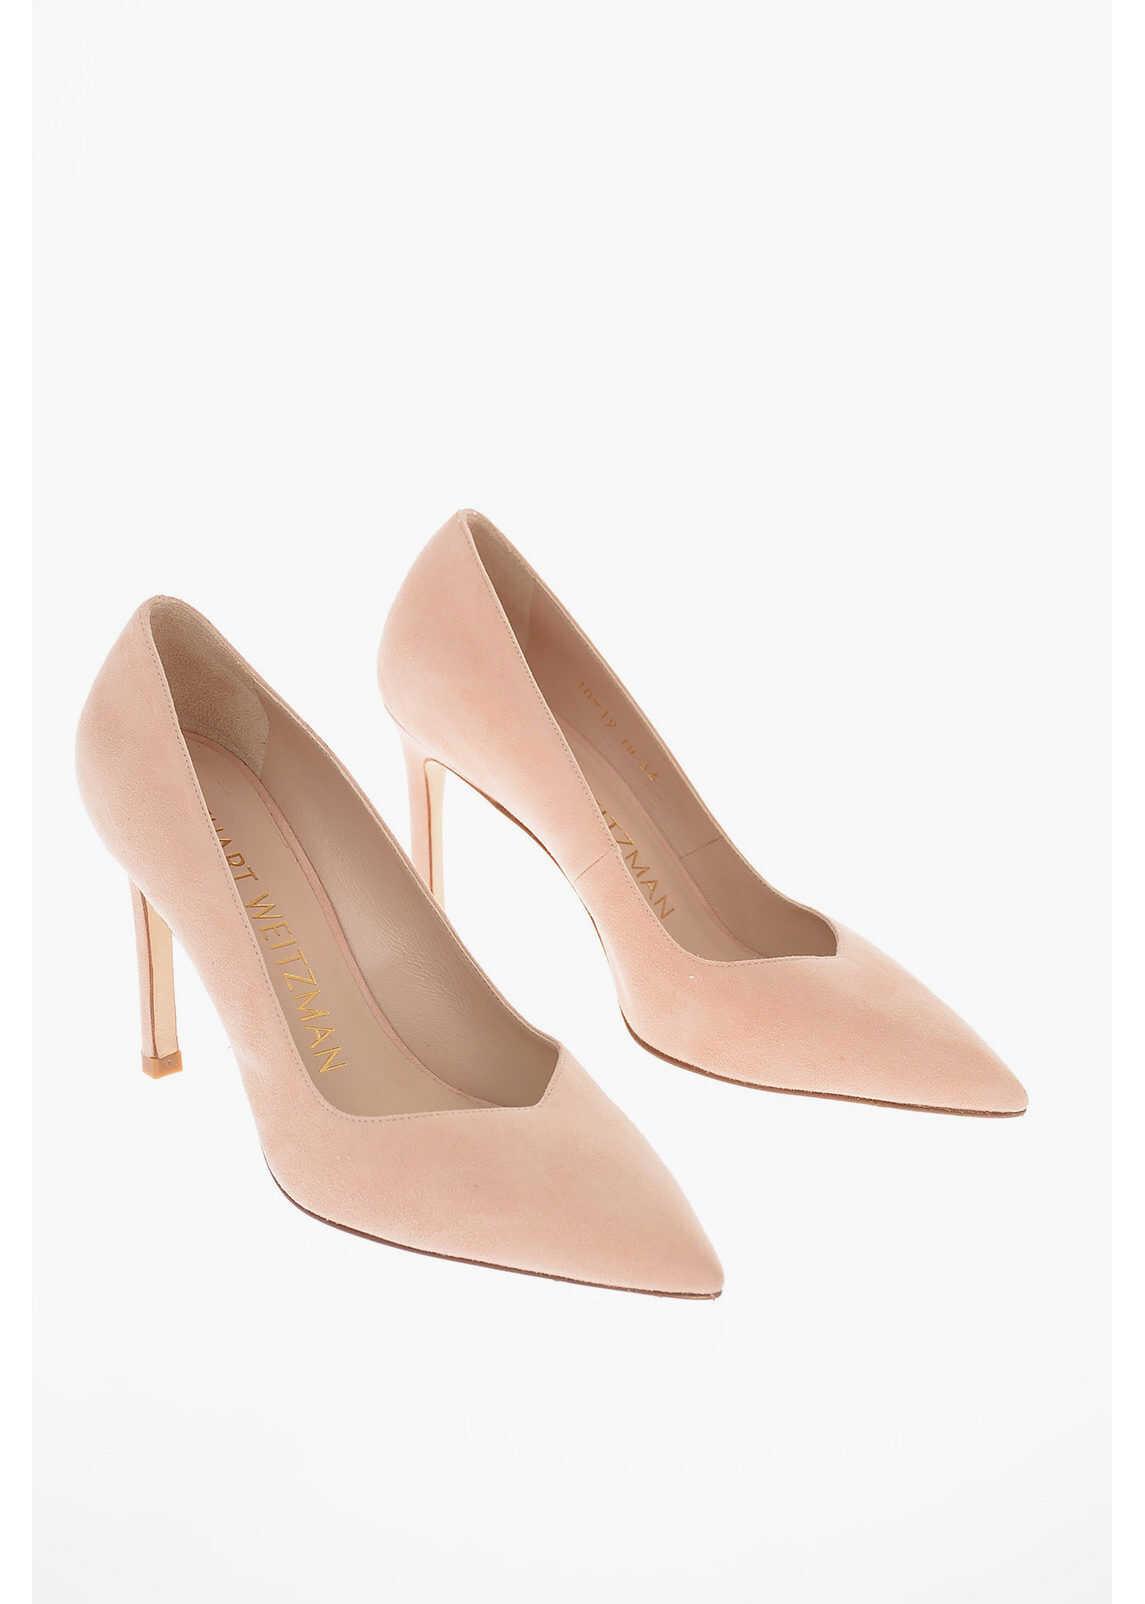 Stuart Weitzman Suede ANNY Pumps with Stiletto Heel 10 Cm PINK imagine b-mall.ro